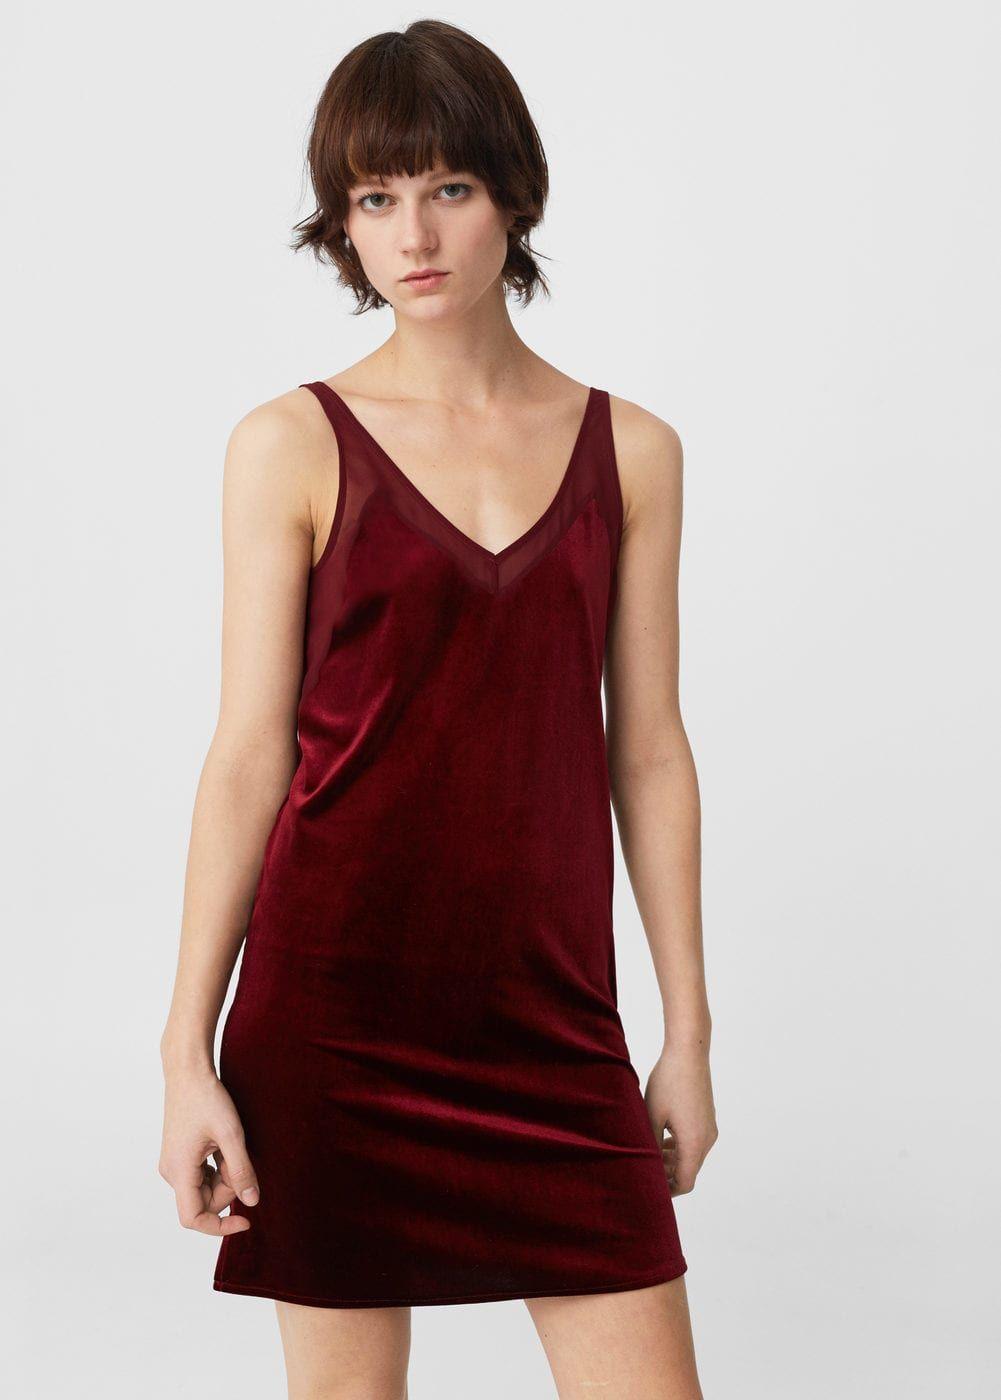 Velvet dress woman woman and fashion